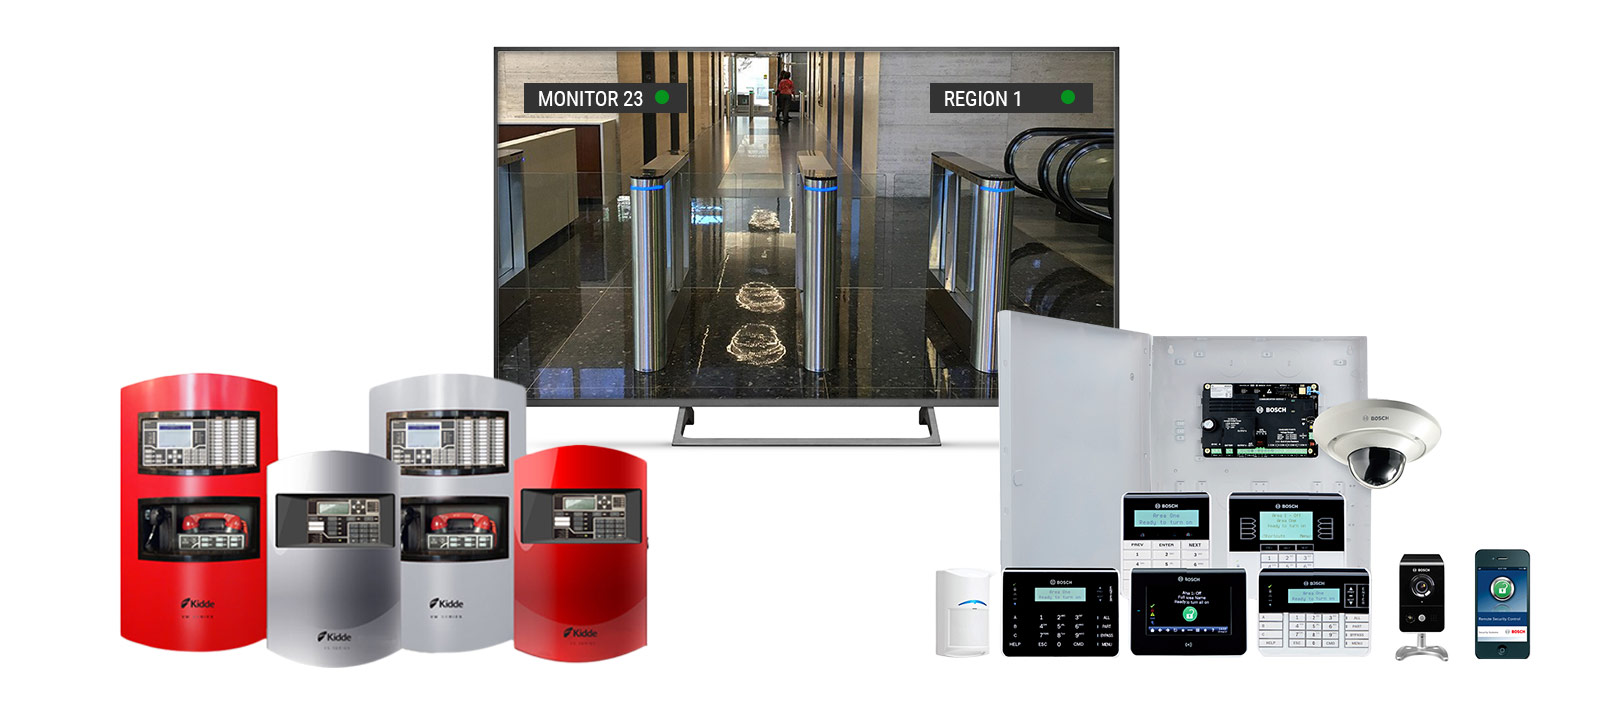 Fire and Burglar Alarm Monitoring Integration